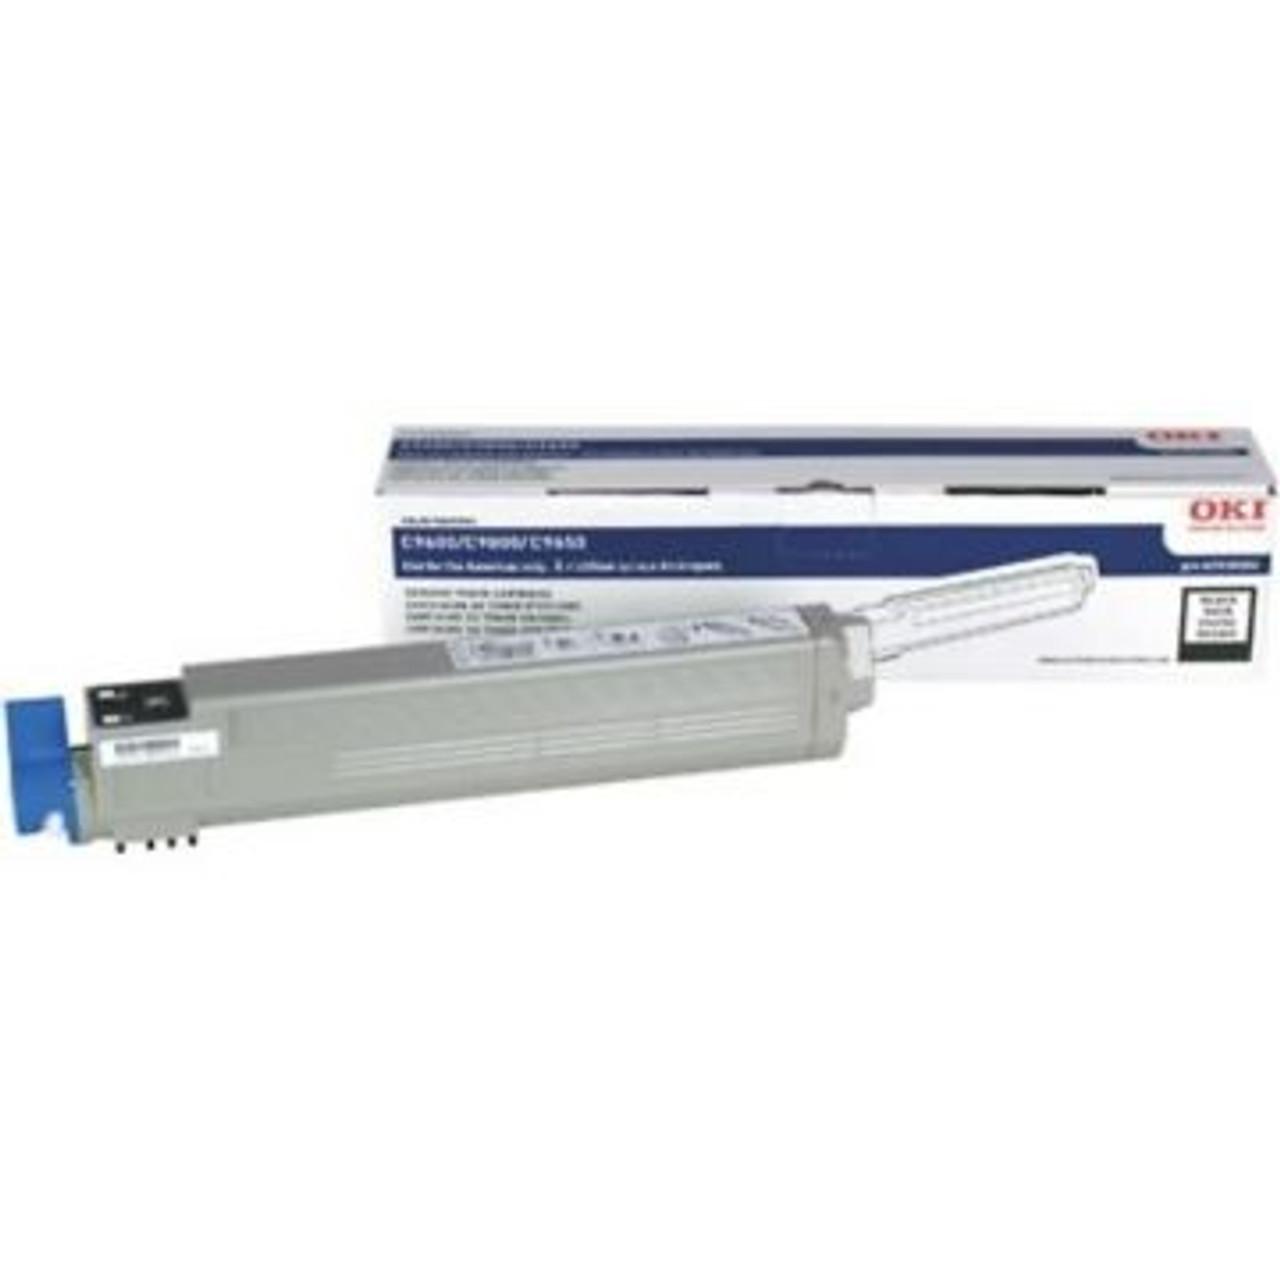 Magenta Toner Cartridge for Okidata Oki C9600 C9850 C9800 42918902 High Yield